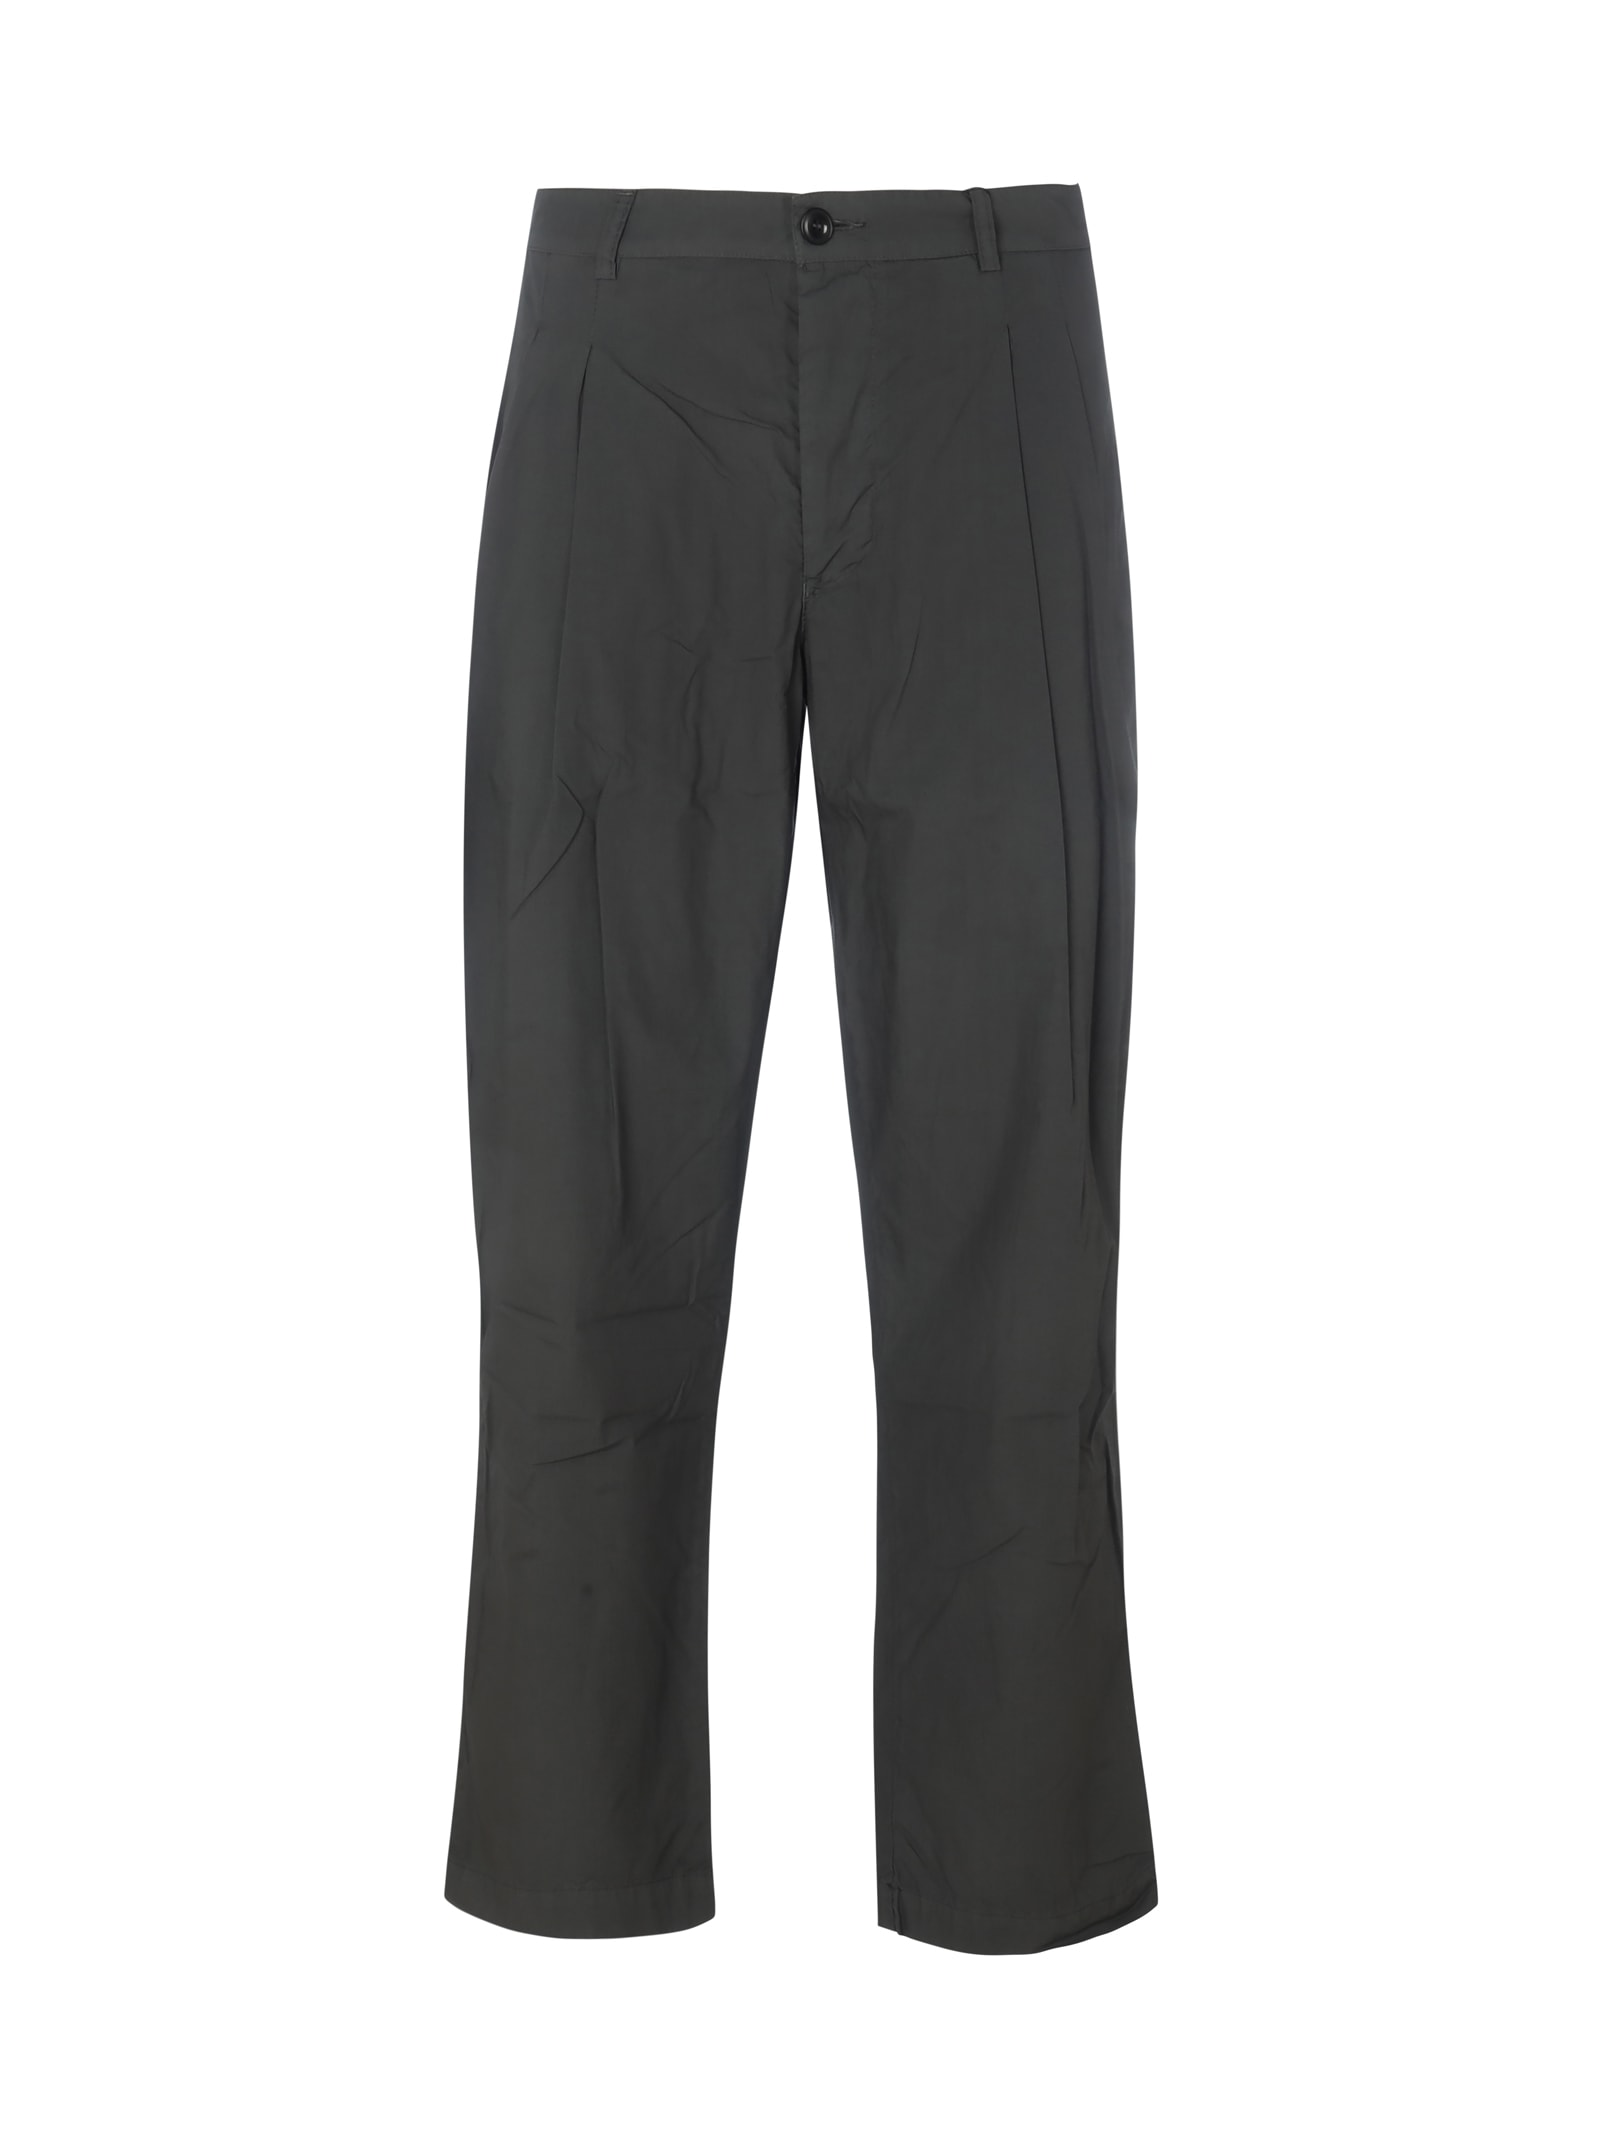 Original Vintage Style Large Popeline Pants